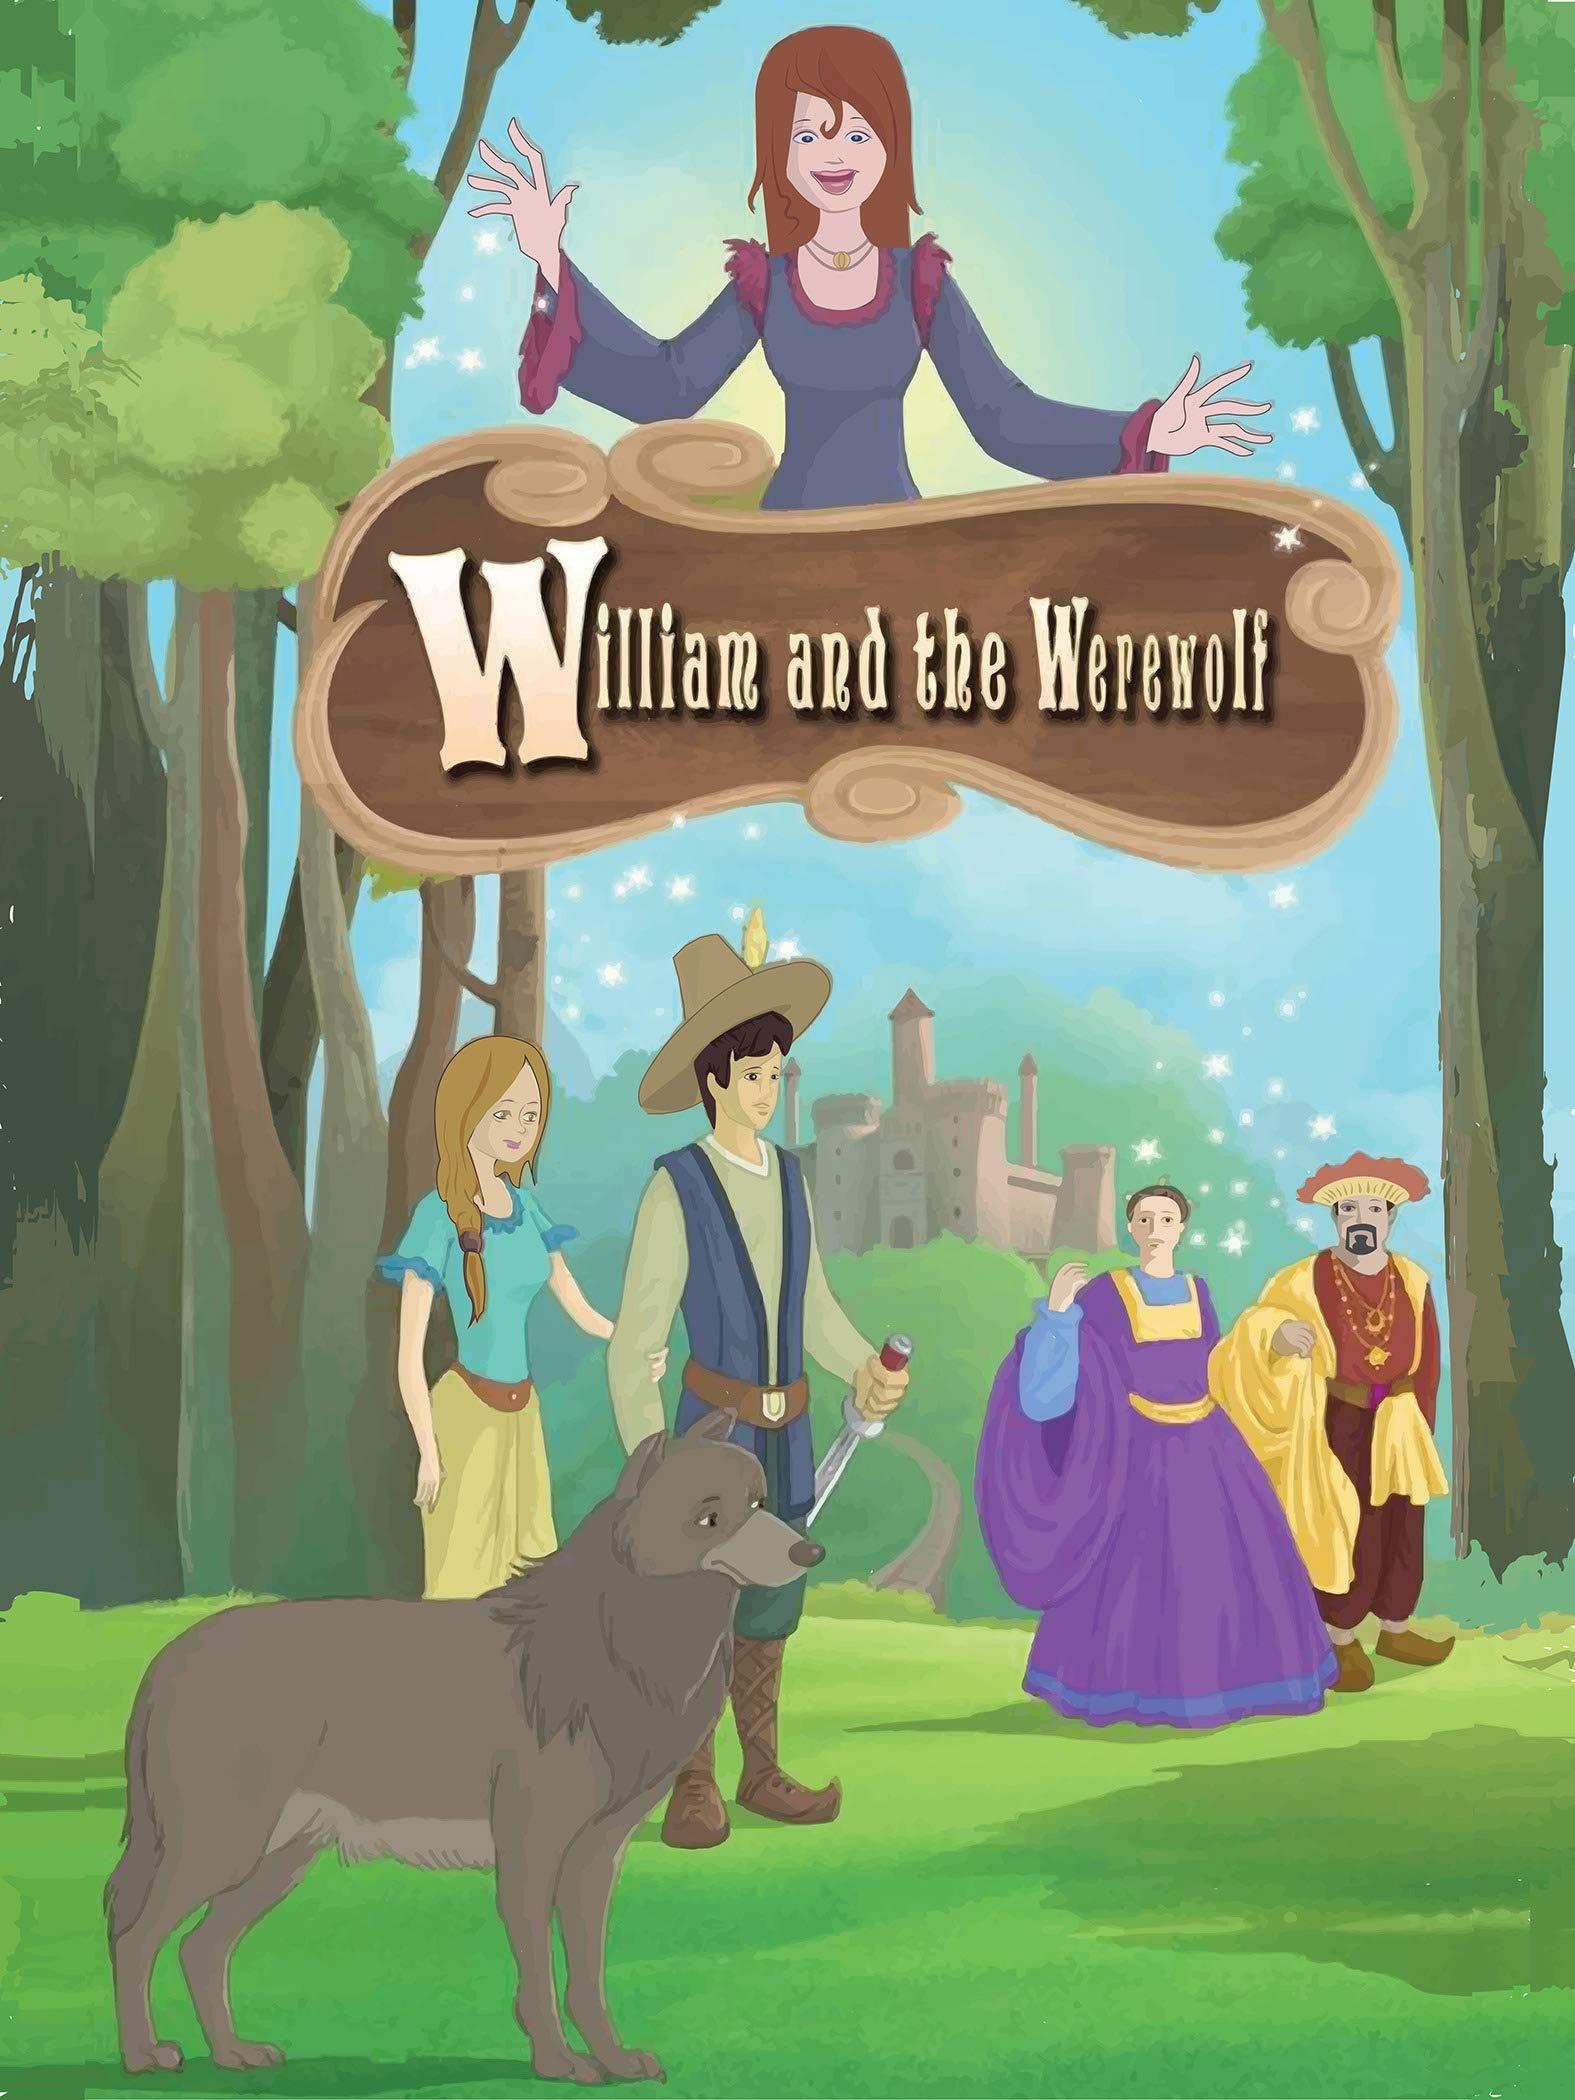 William and the Werewolf